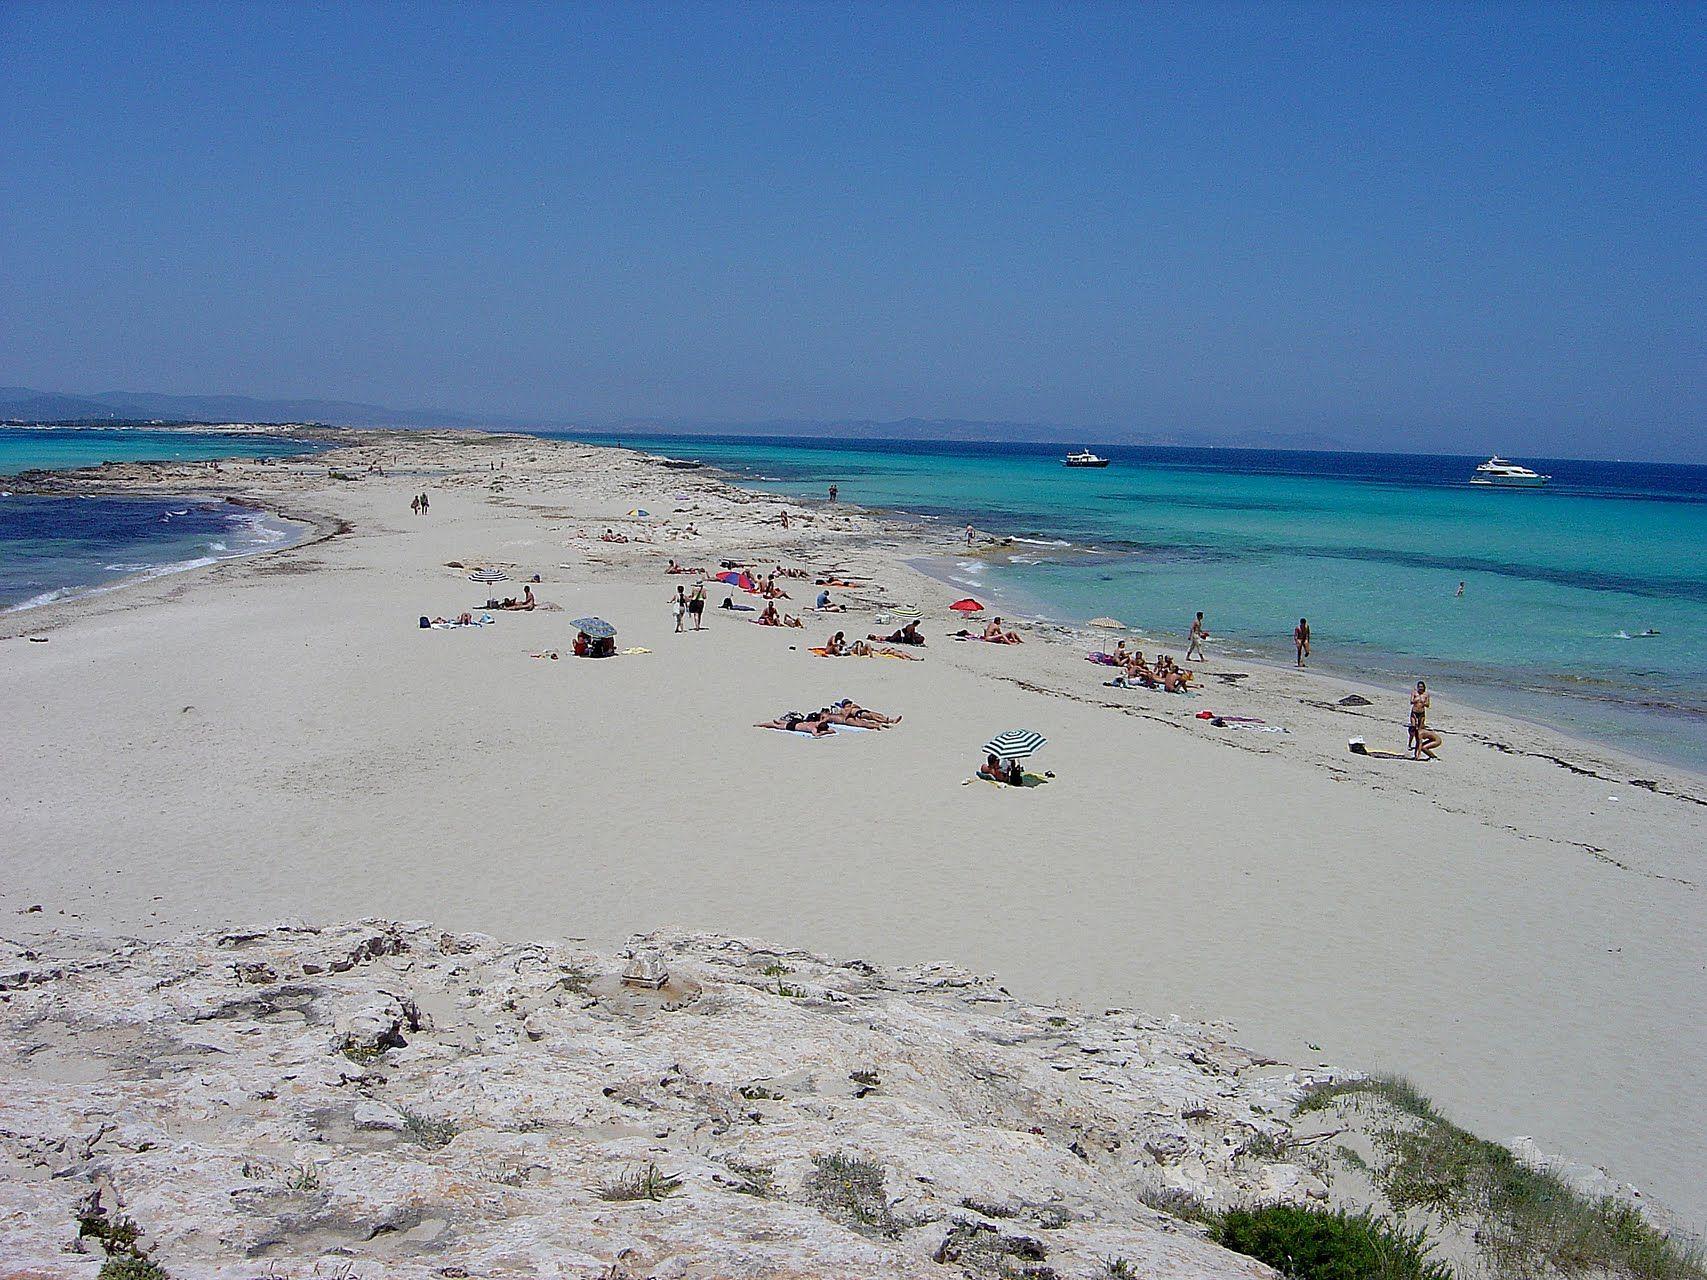 playa de ses illetes formentera mallorca spain